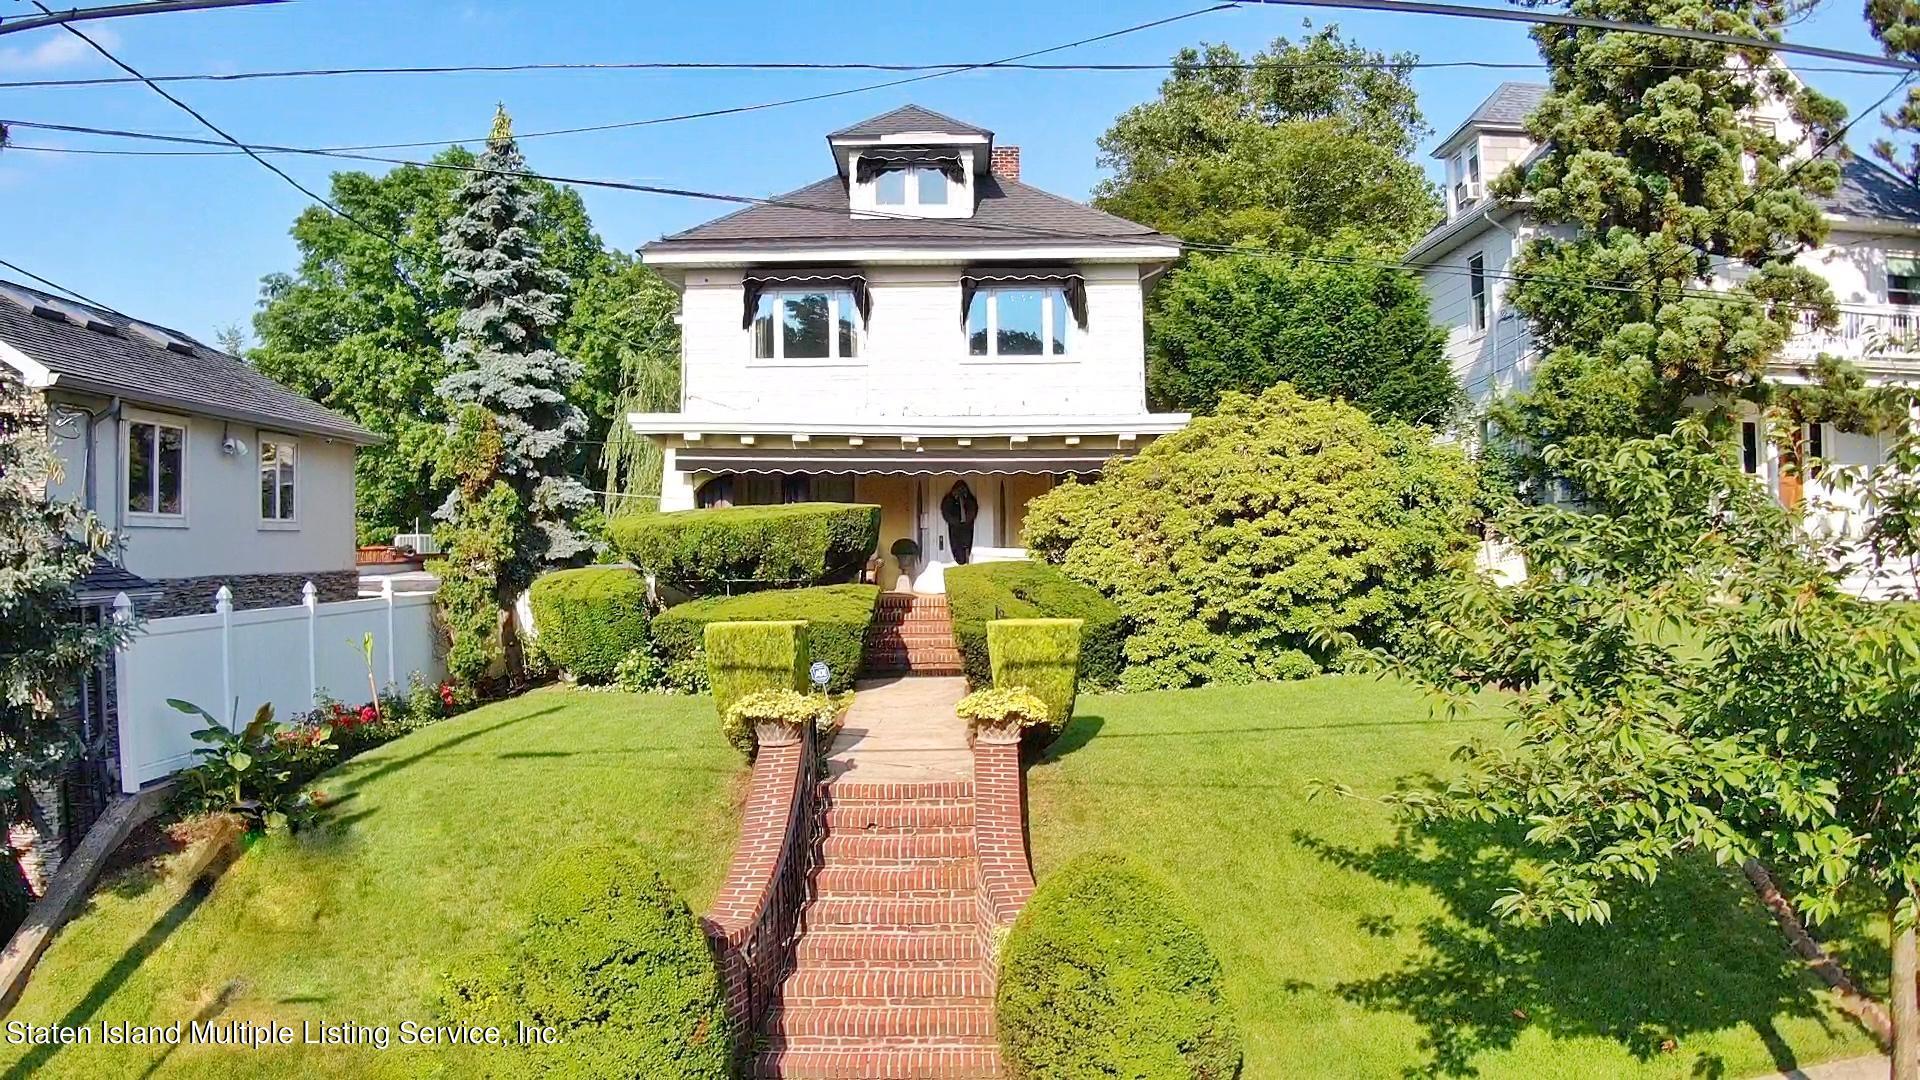 Single Family - Detached 311 Bement Avenue  Staten Island, NY 10310, MLS-1147133-2